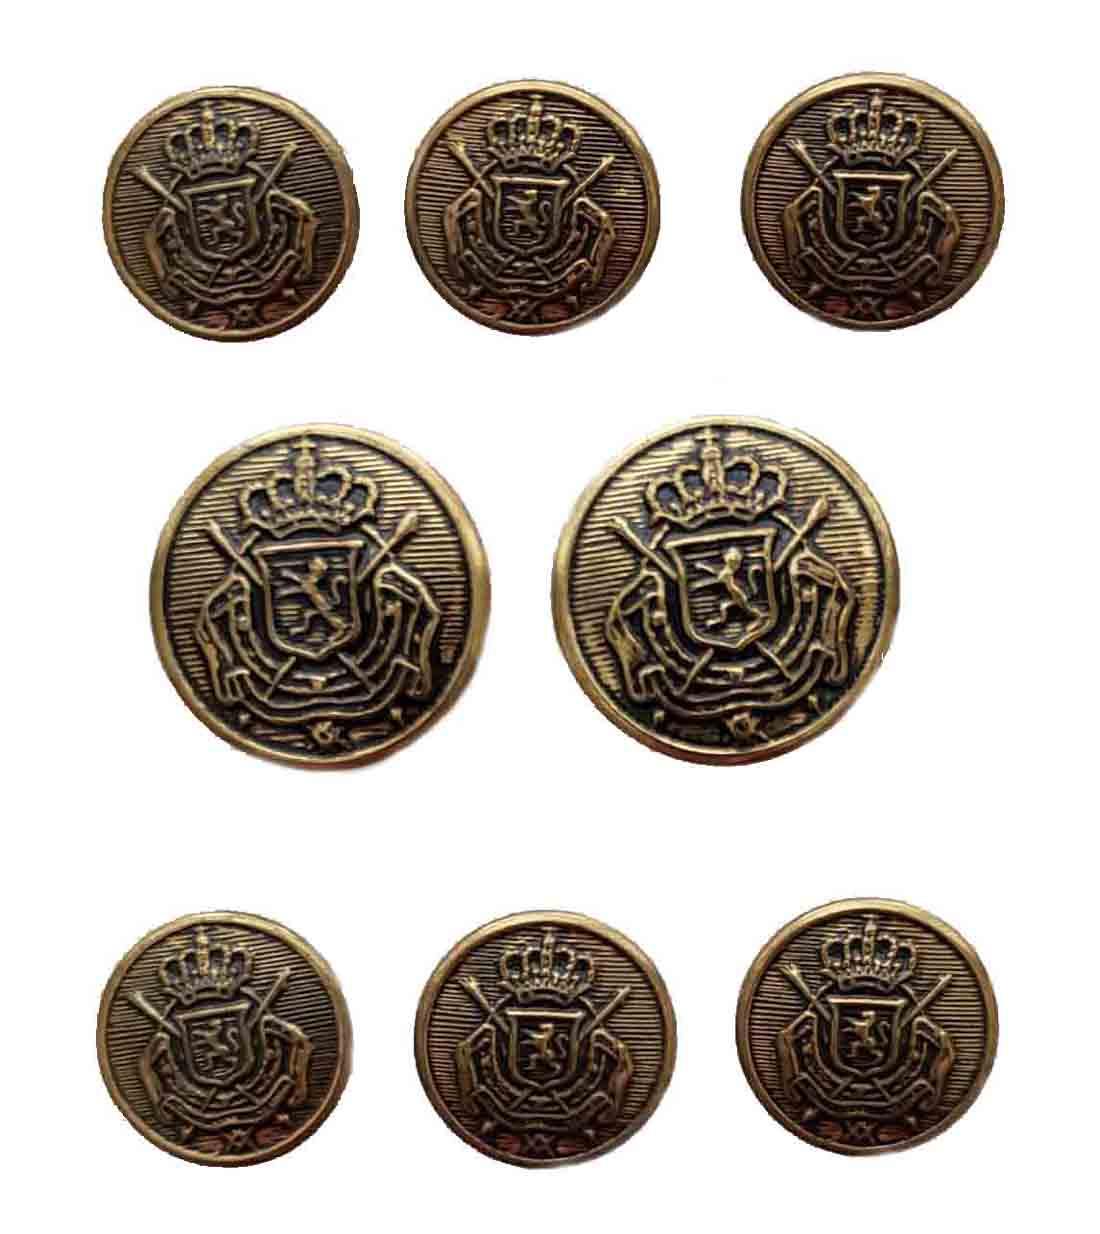 Vintage Haggar Antique Gold Blazer Buttons Set Brass Belgian Crest Shank Men's